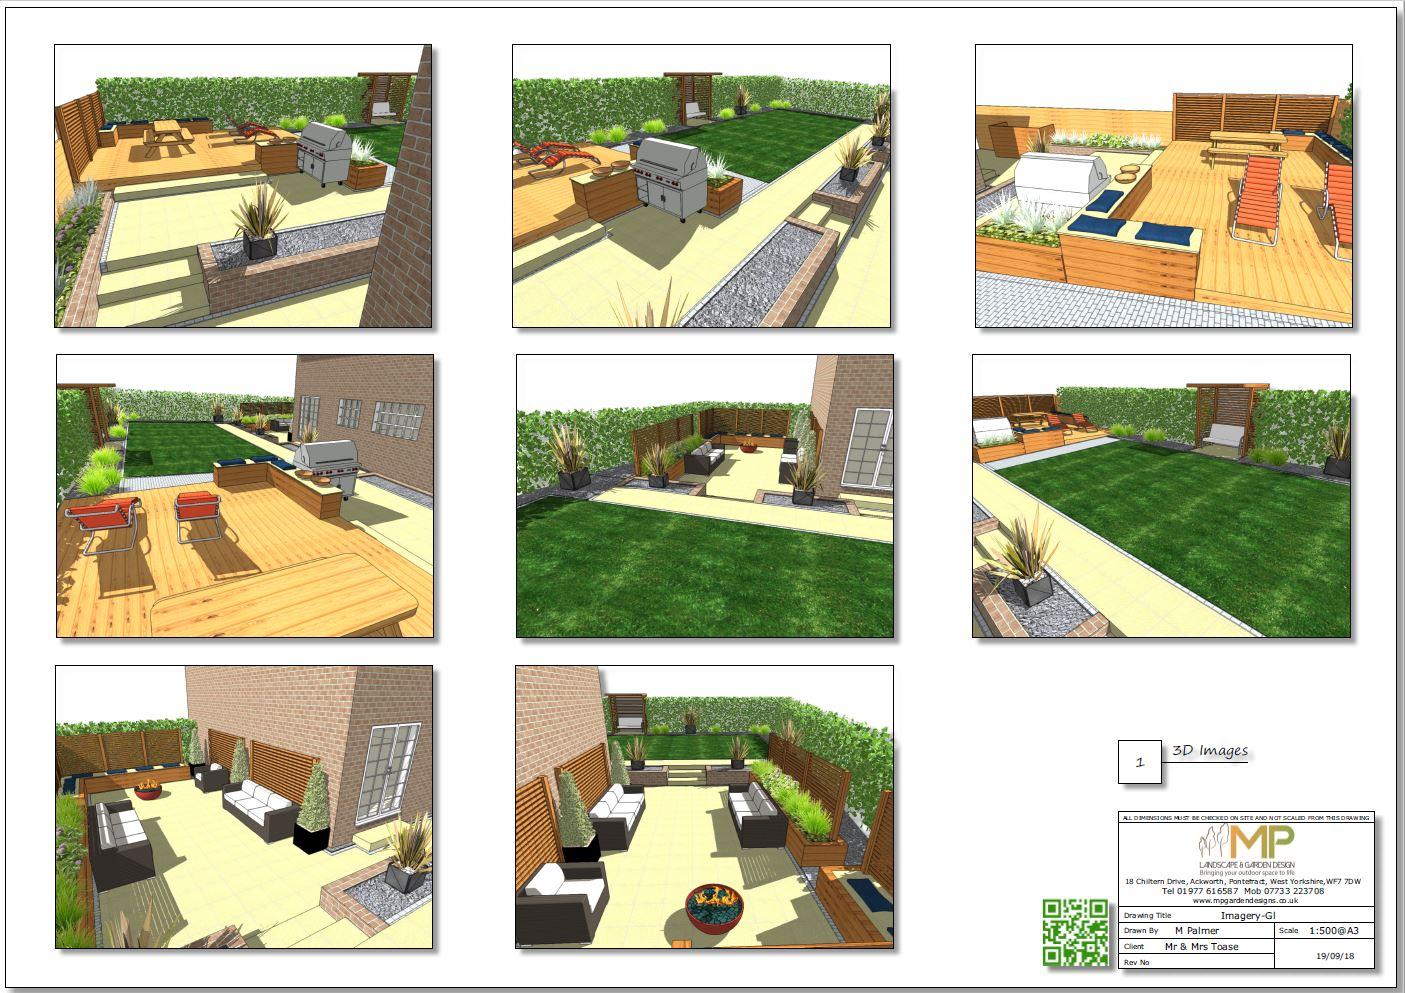 Garden design layout plan 3D images for a rear garden in Wakefield